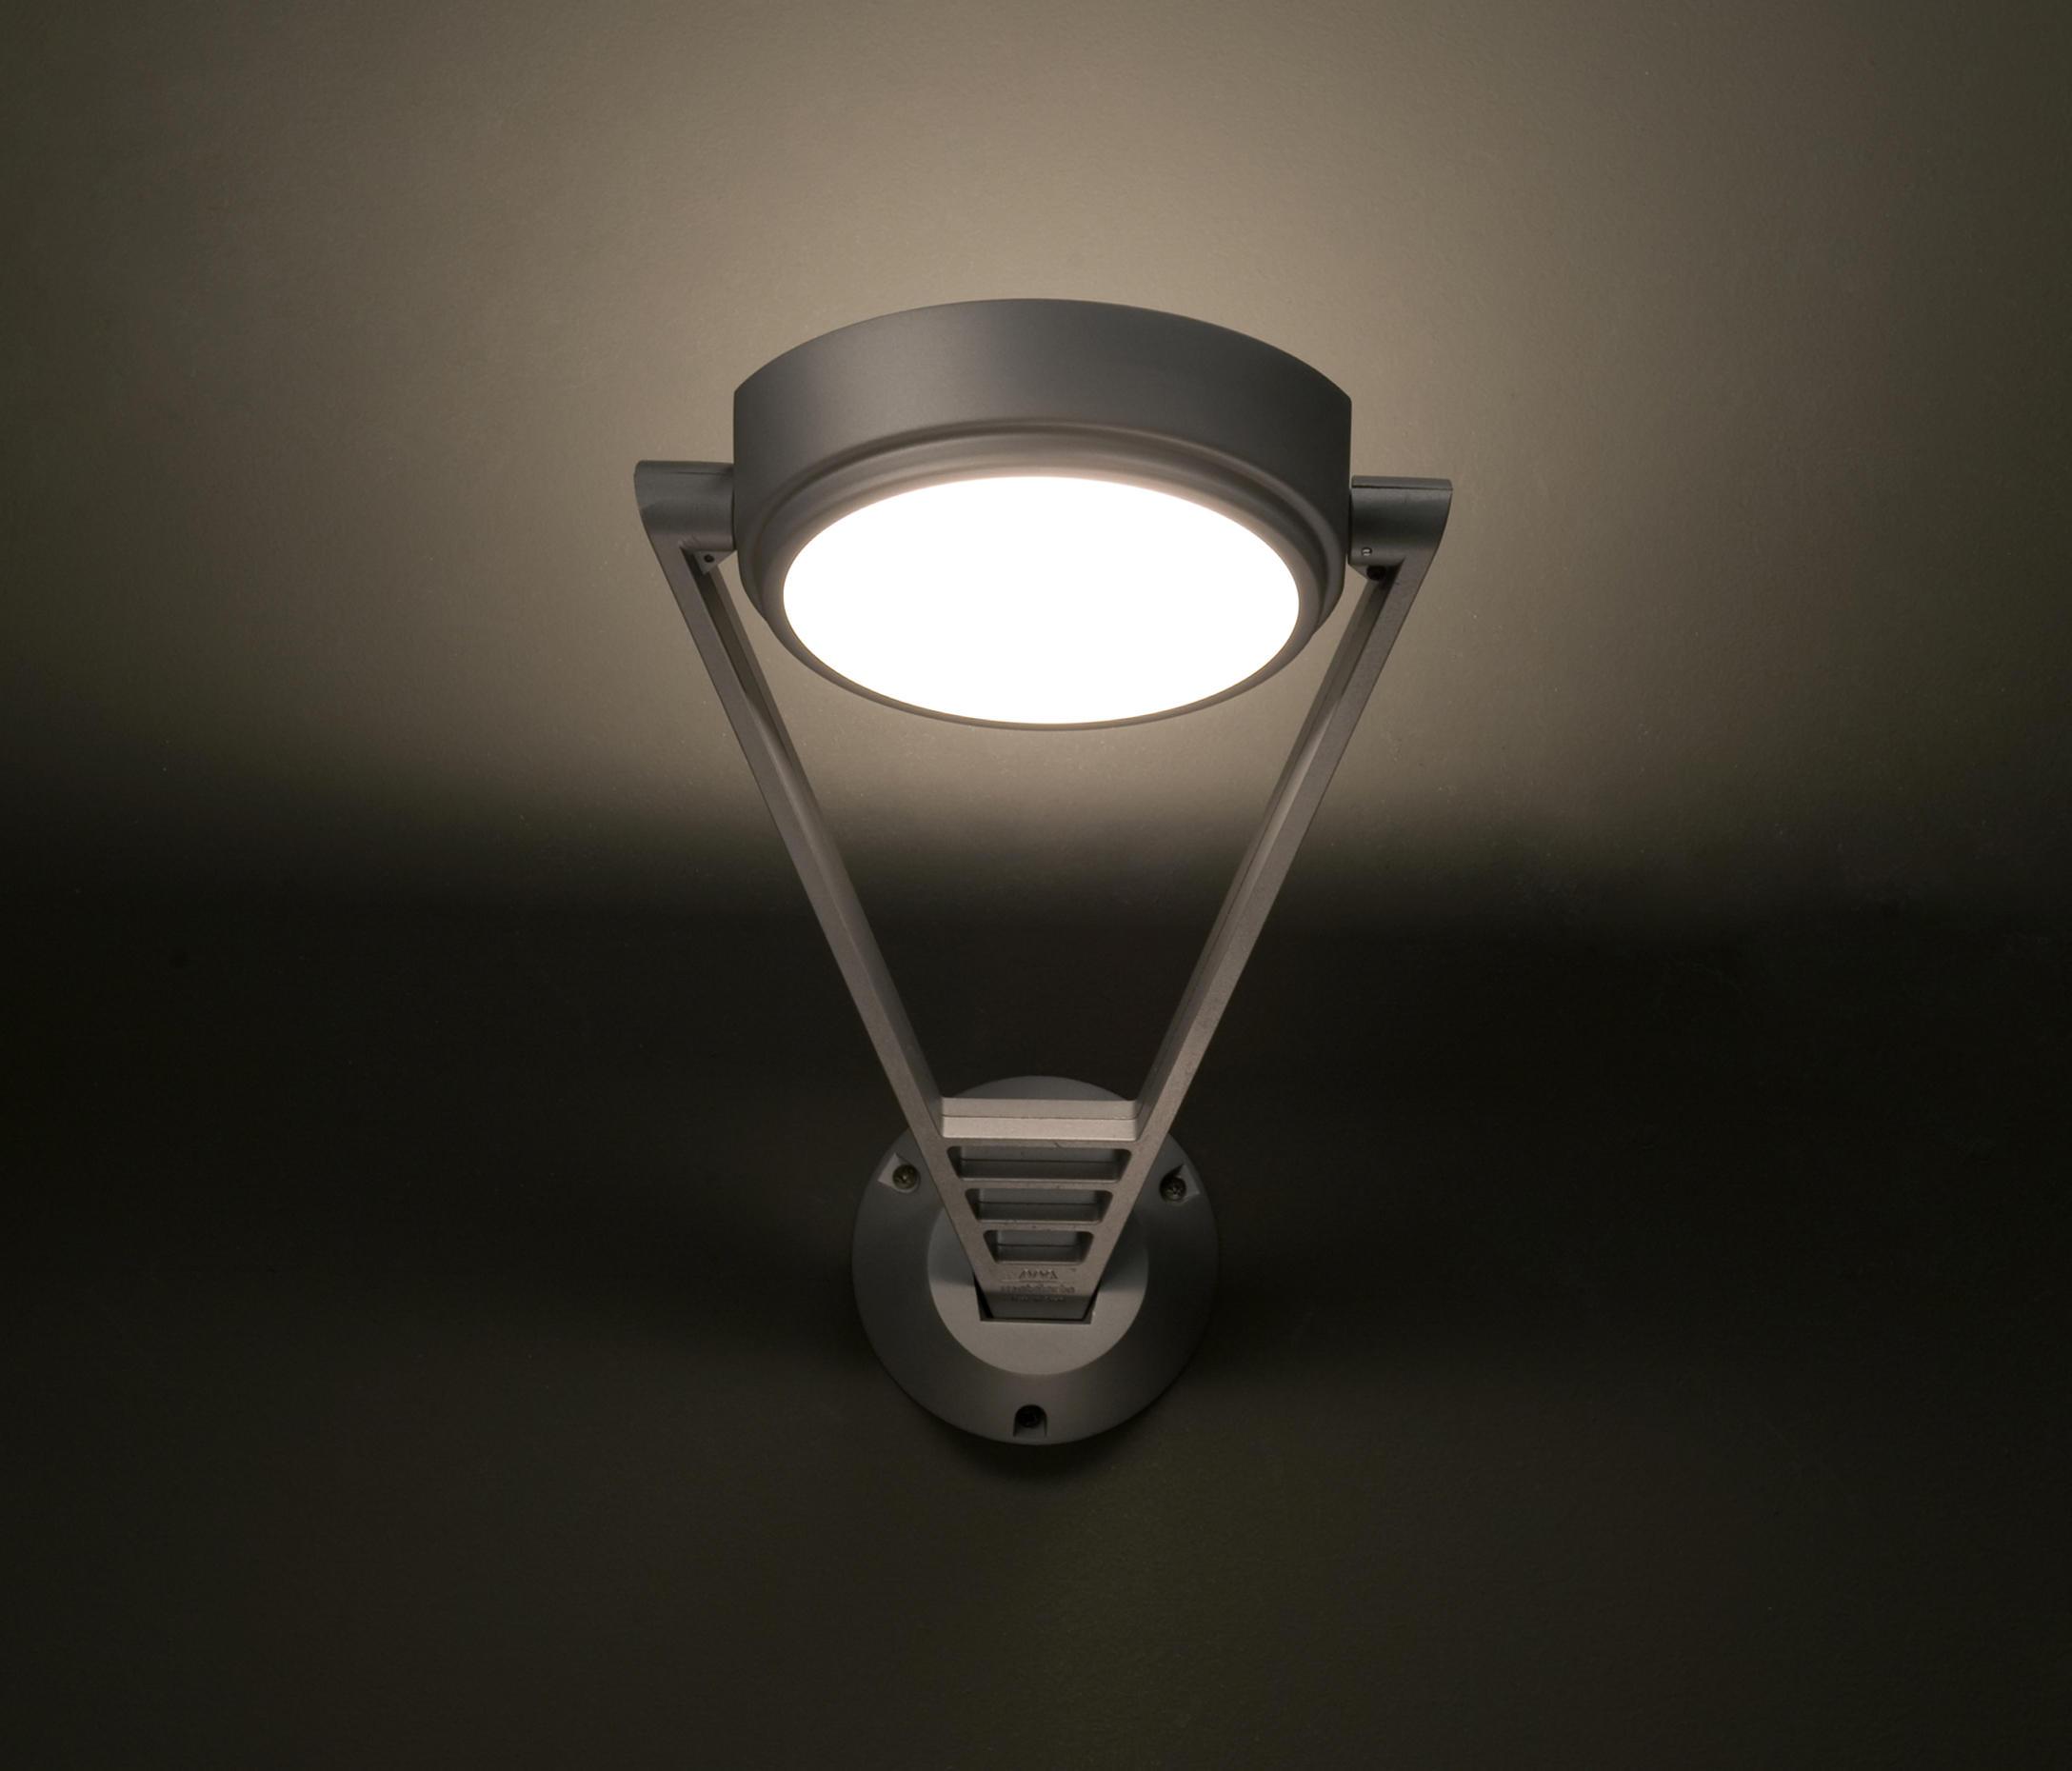 Metalarte Wall Lights : VULCANOS 1223 WALL LAMP - General lighting from Metalarte Architonic